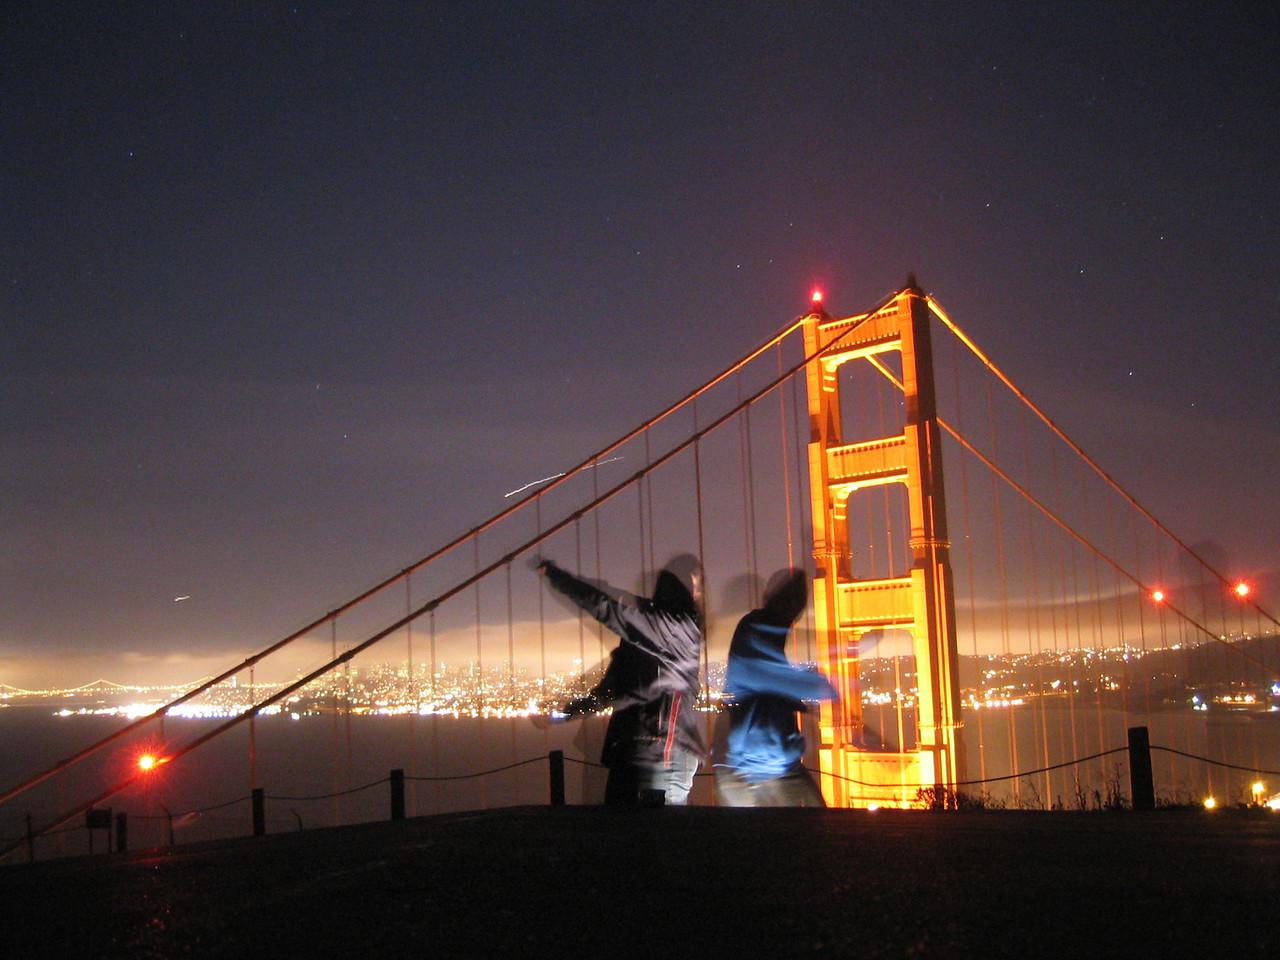 2004 07 12 Monday - Carrie, Melody, & ghost Ben @ Golden Gate Bridge